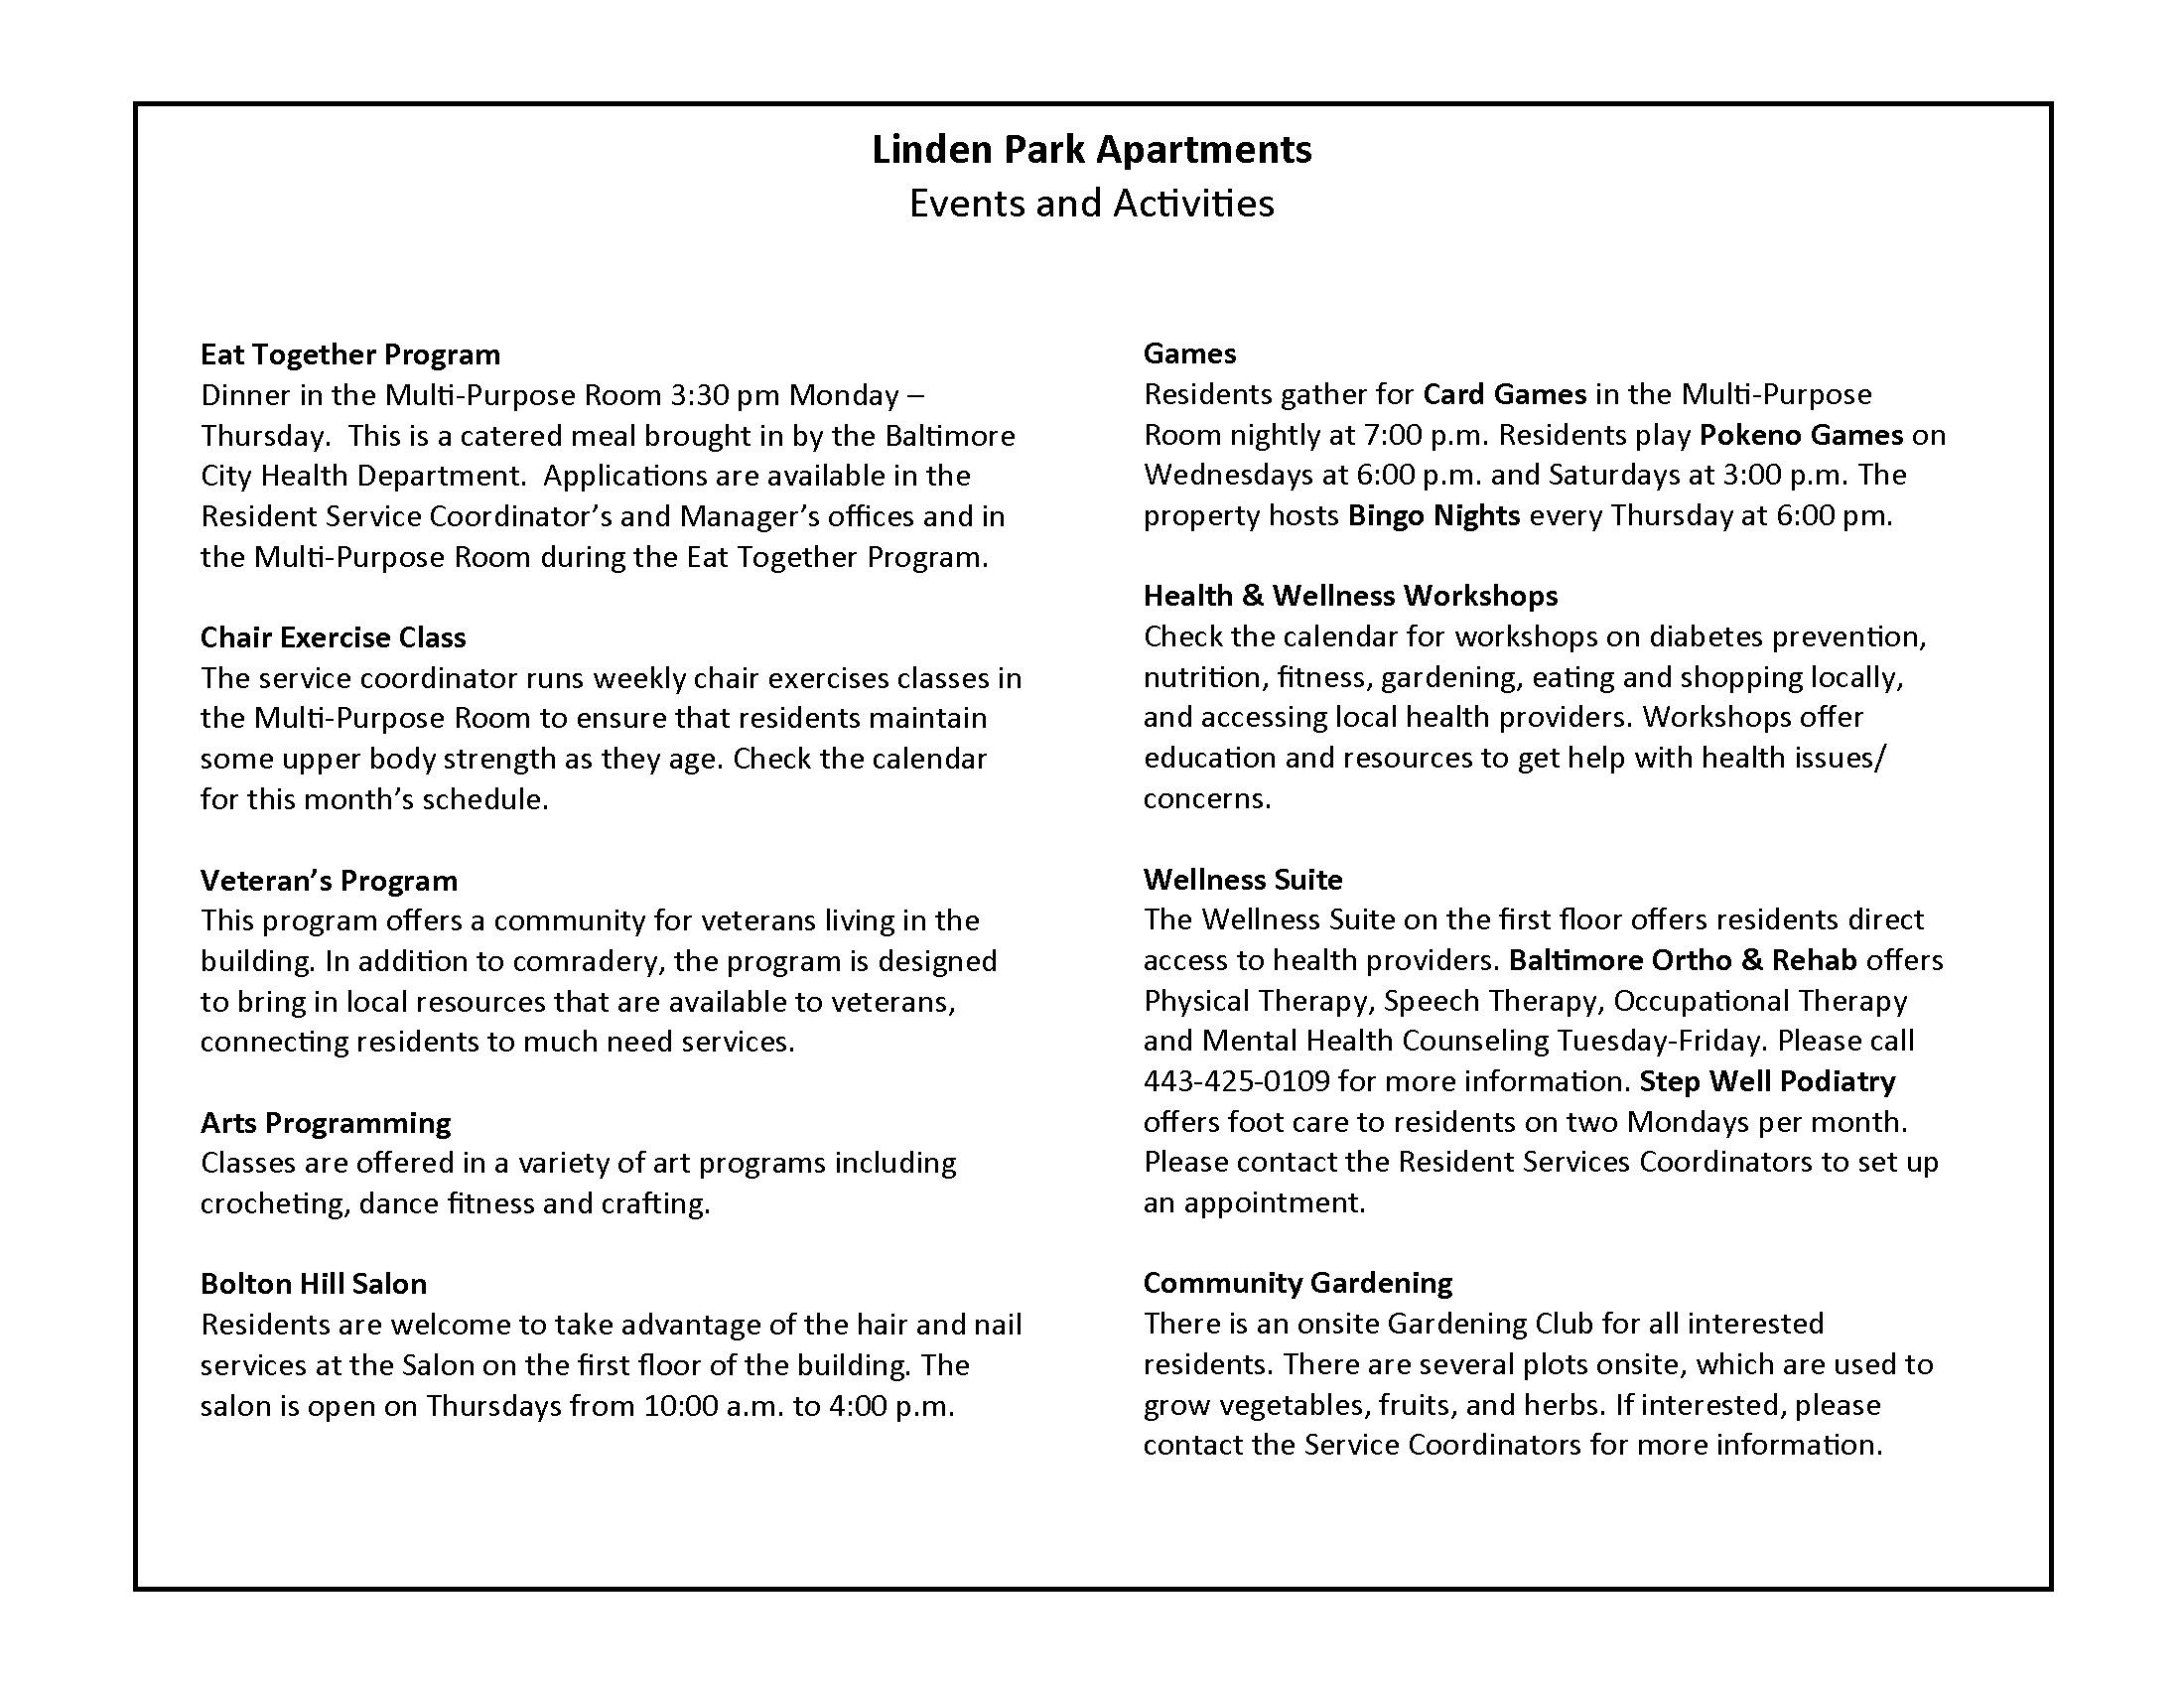 May 2018 Linden Park Apartments Activity Calendar